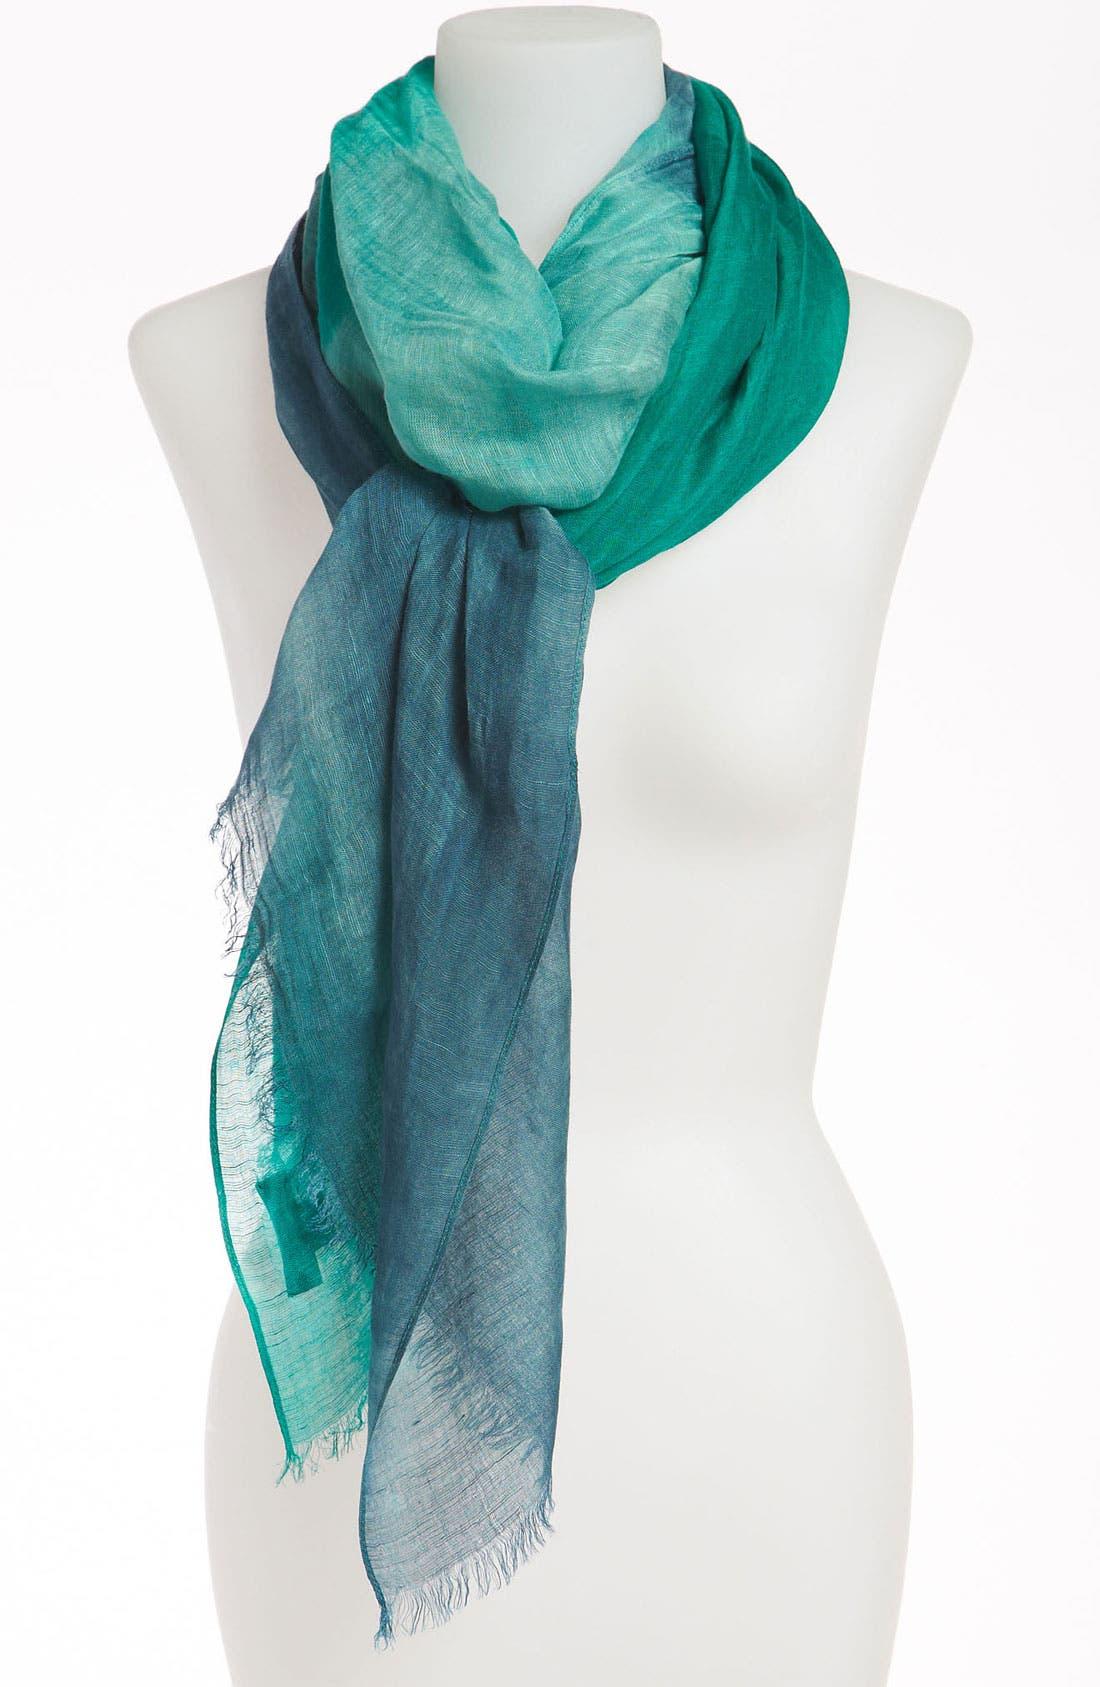 Main Image - Sonia Rykiel 'Tricolor' Linen Blend Stole